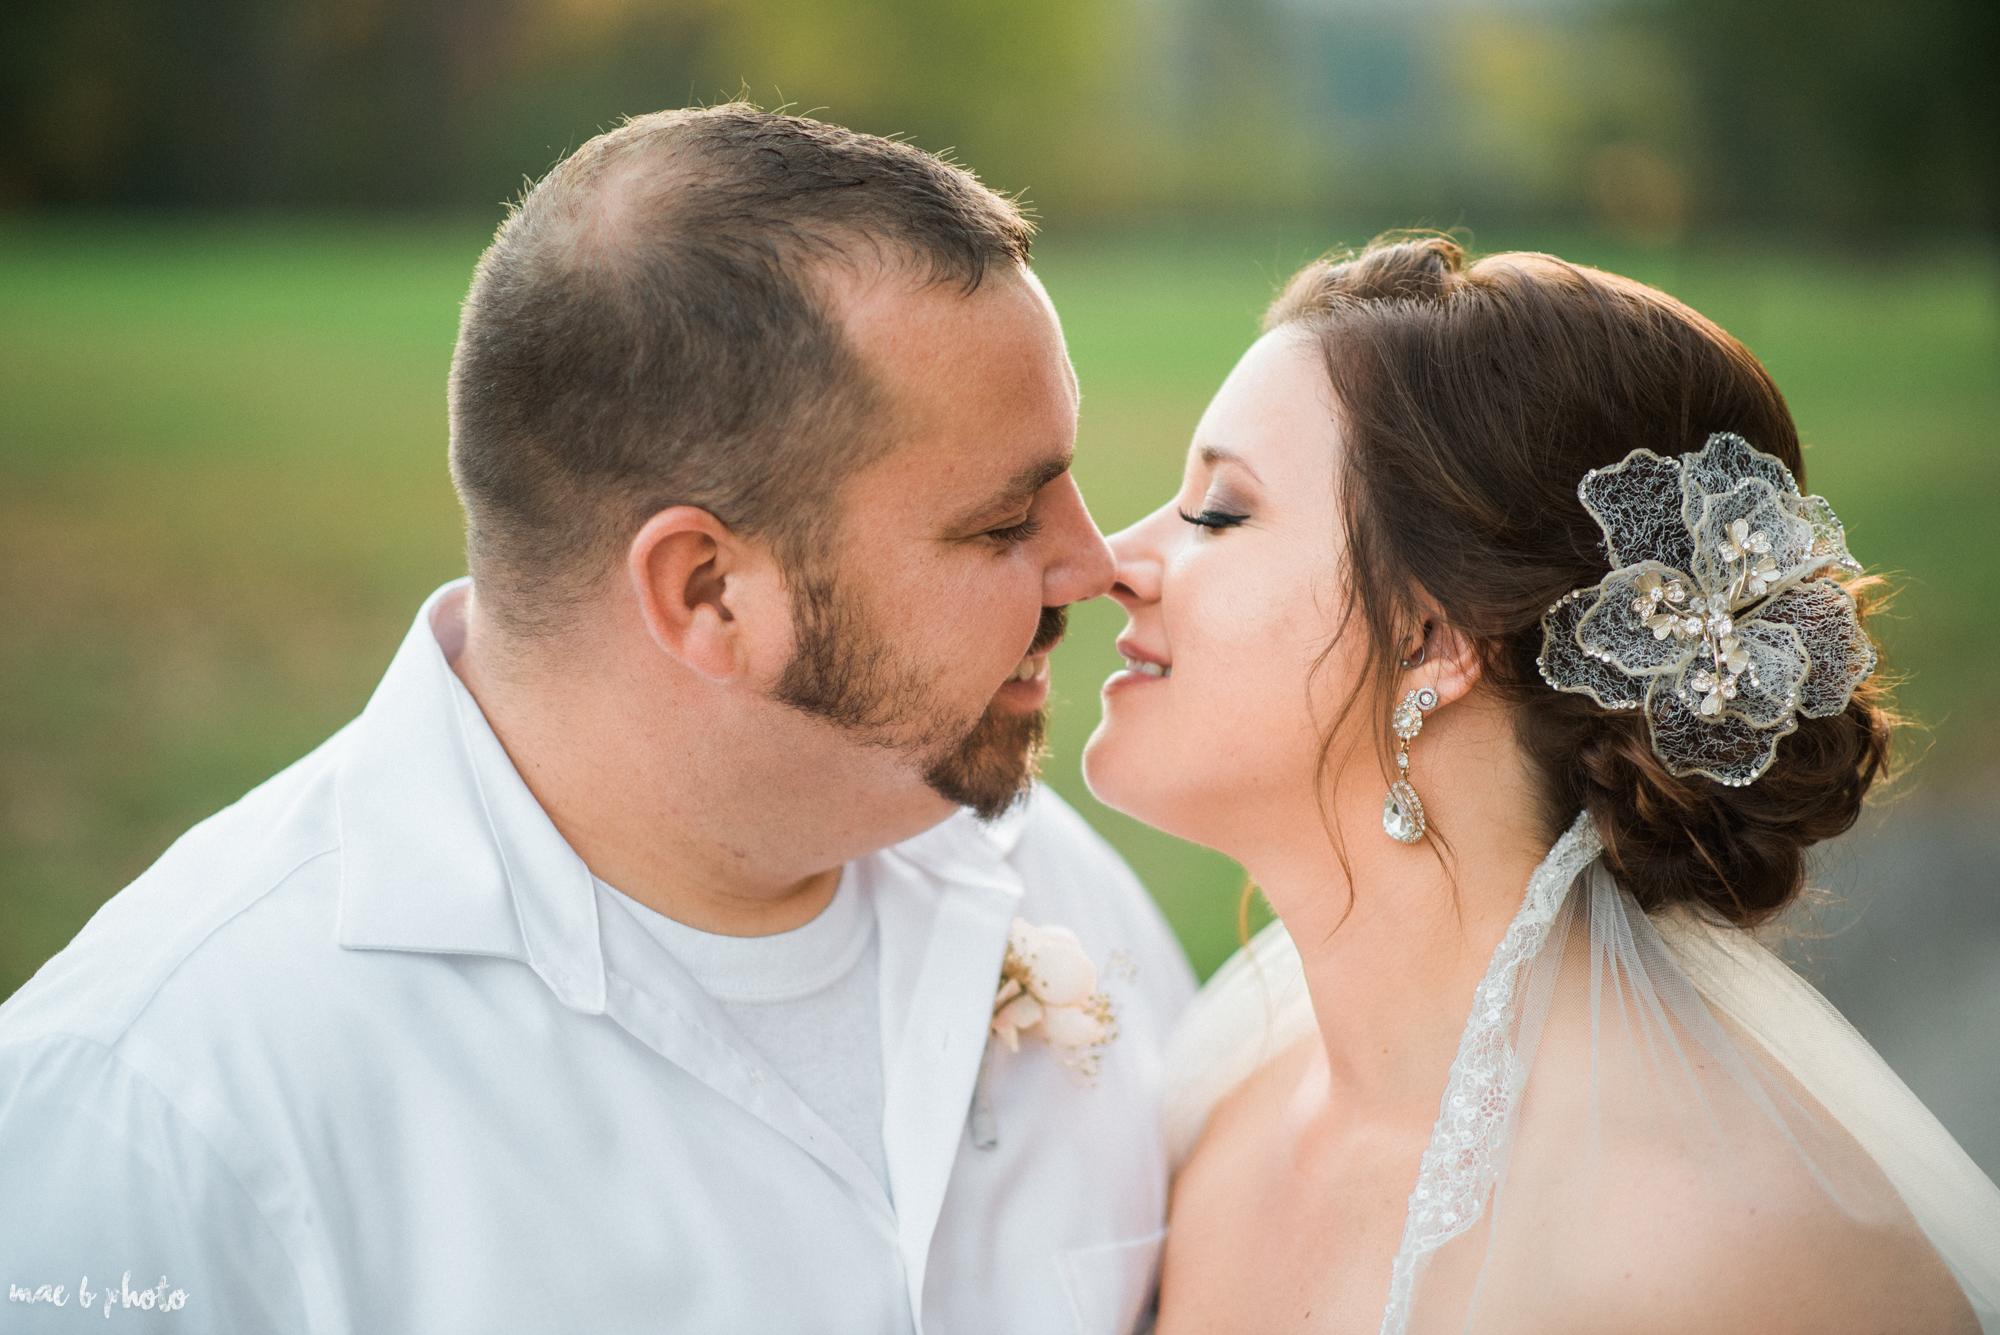 Sarah & Dustin's Rustic Chic Barn Wedding at Hartford Hill Winery in Hartford, Ohio by Mae B Photo-86.jpg